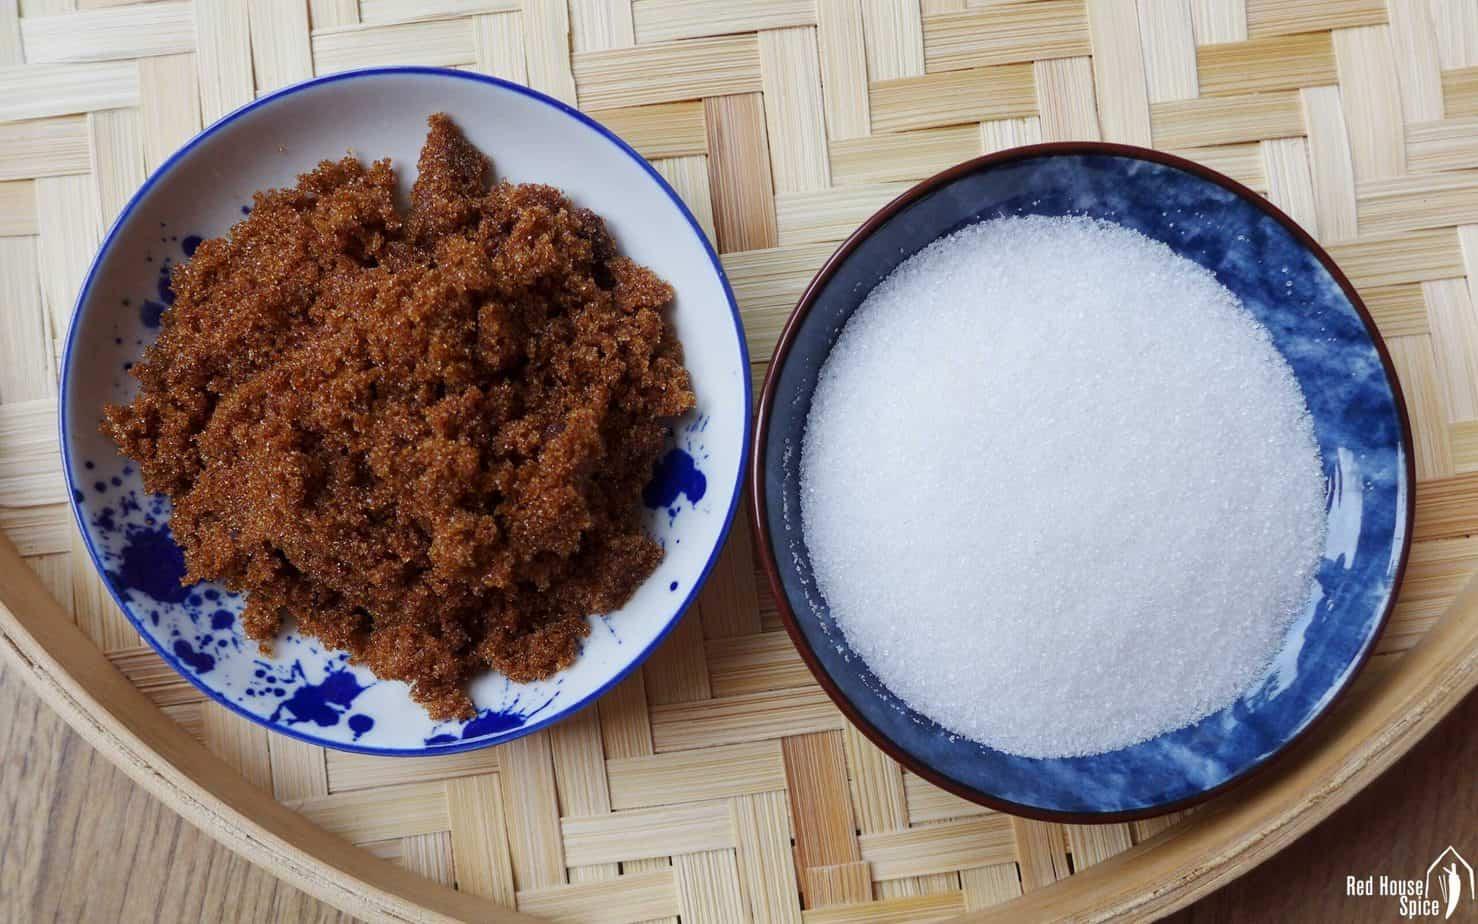 White sugar and dark brown sugar